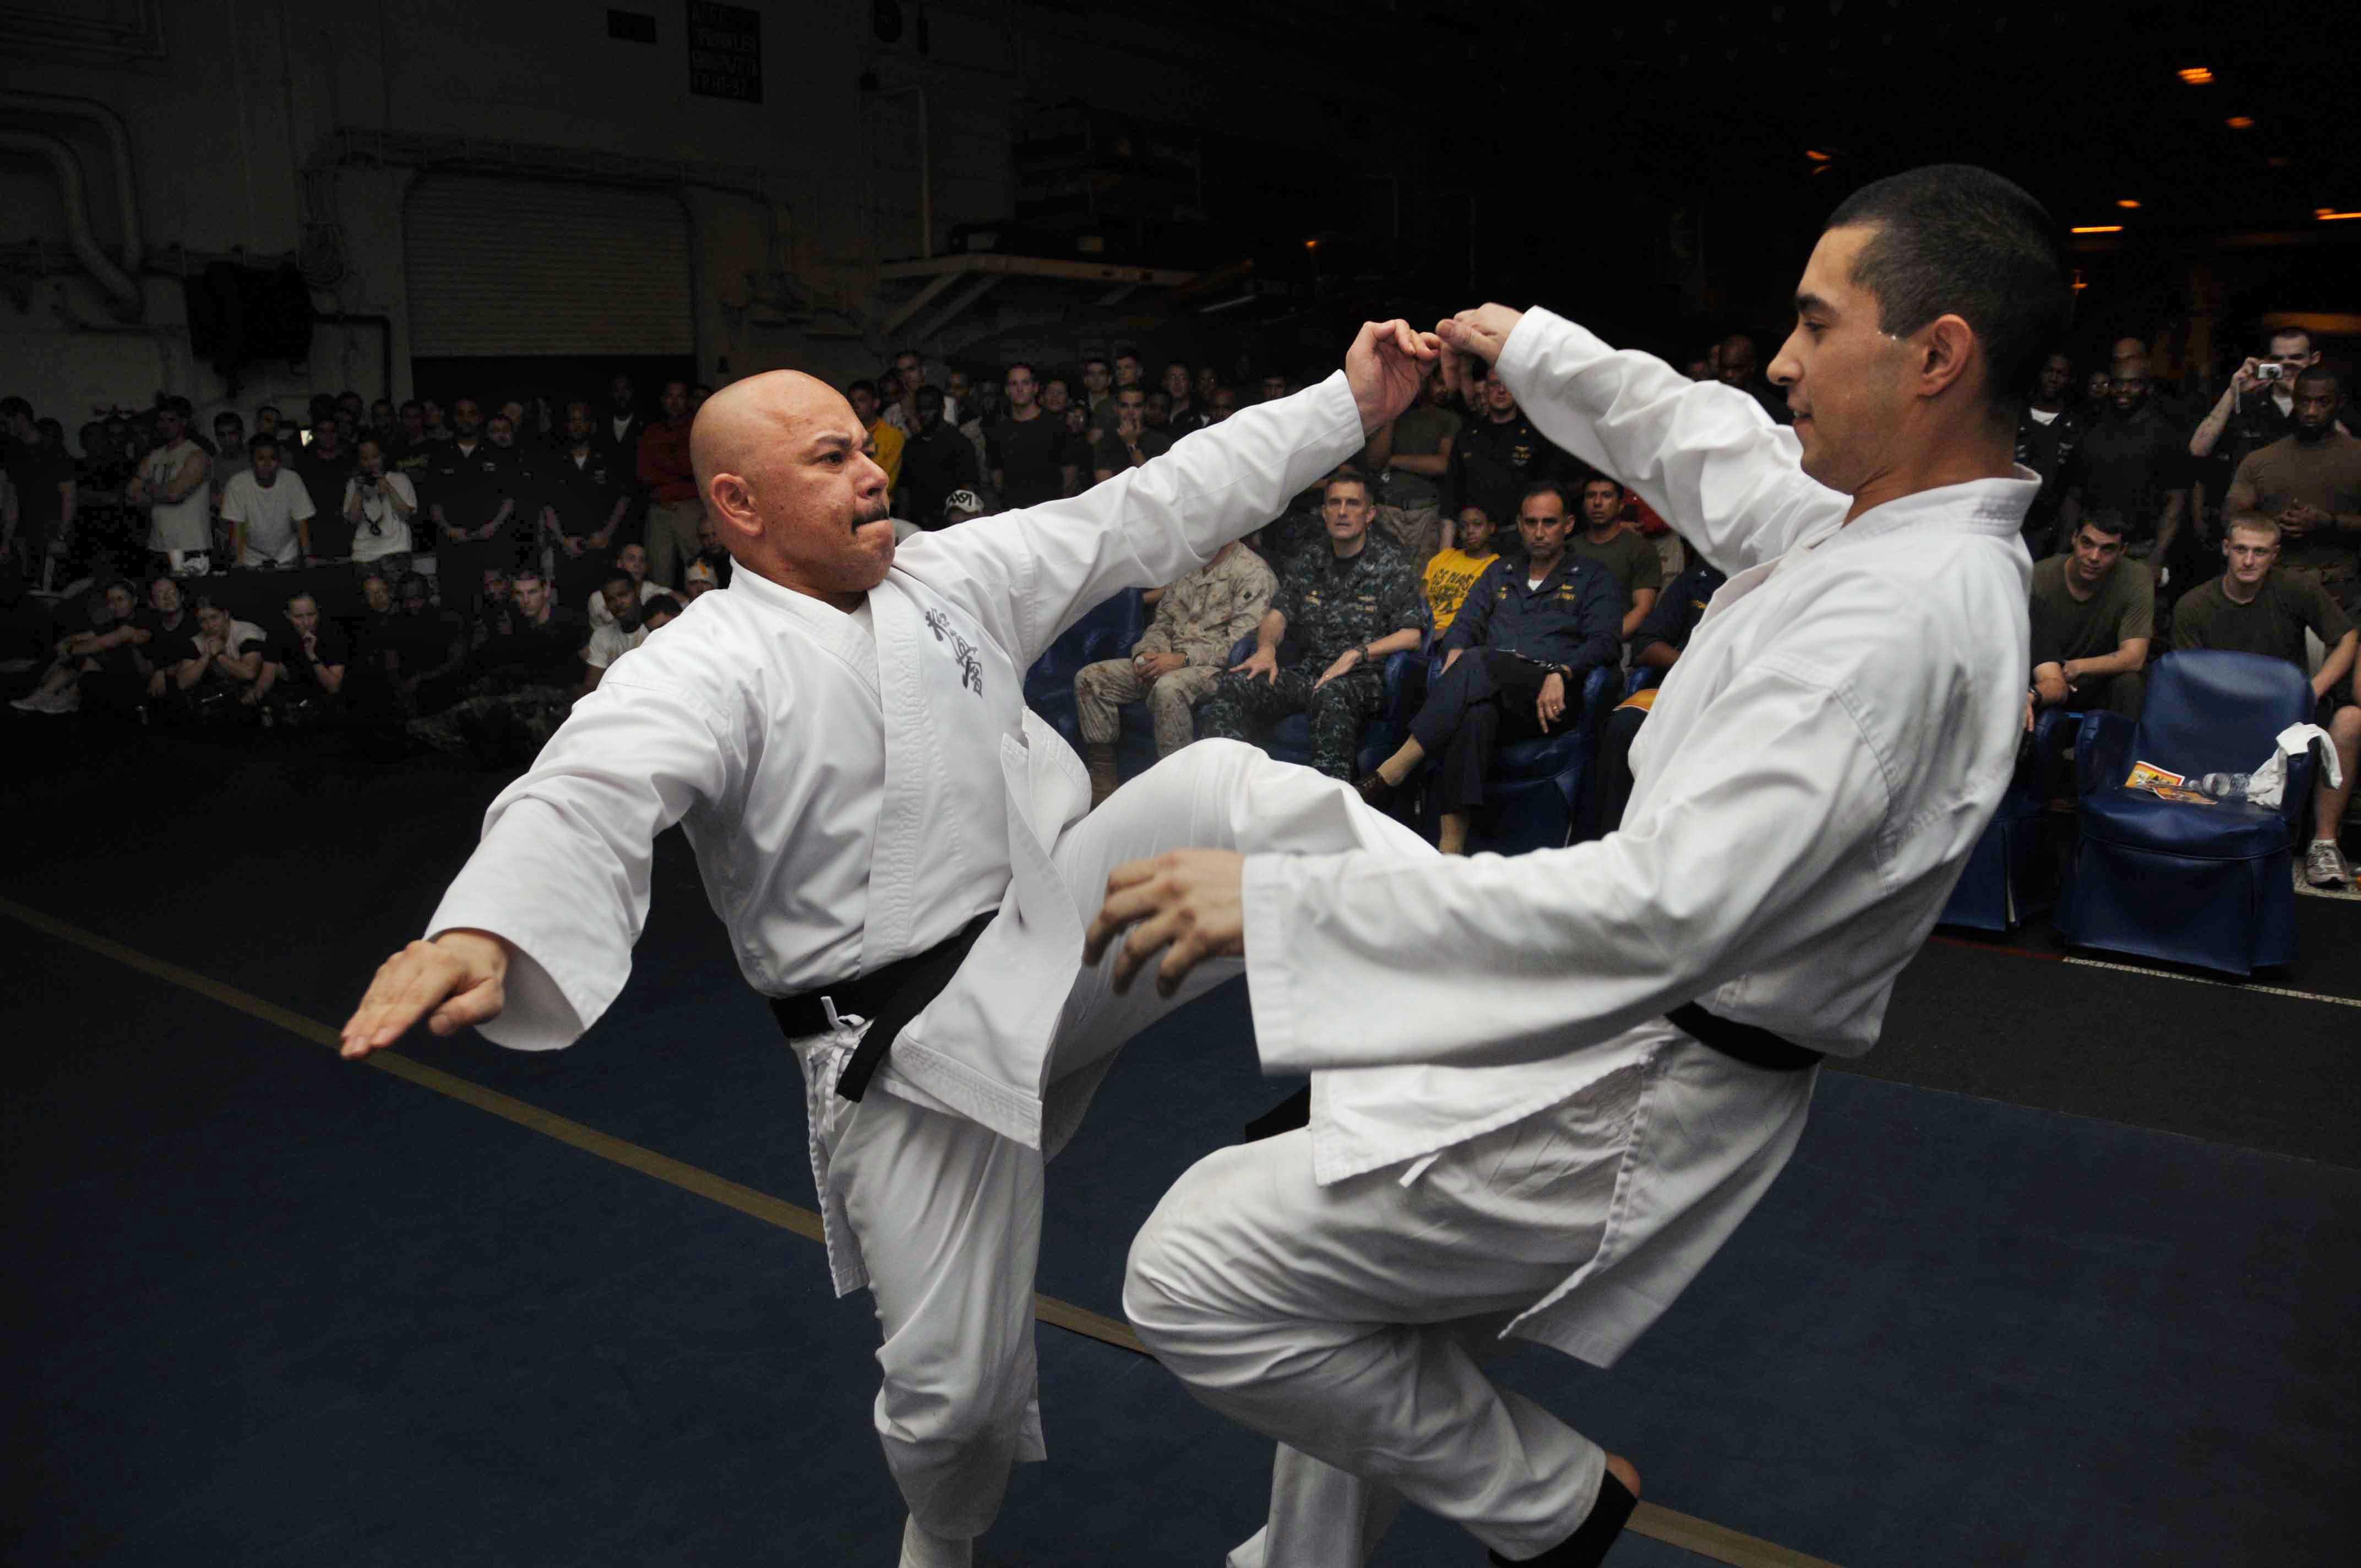 Discovering Kyokushin Karate